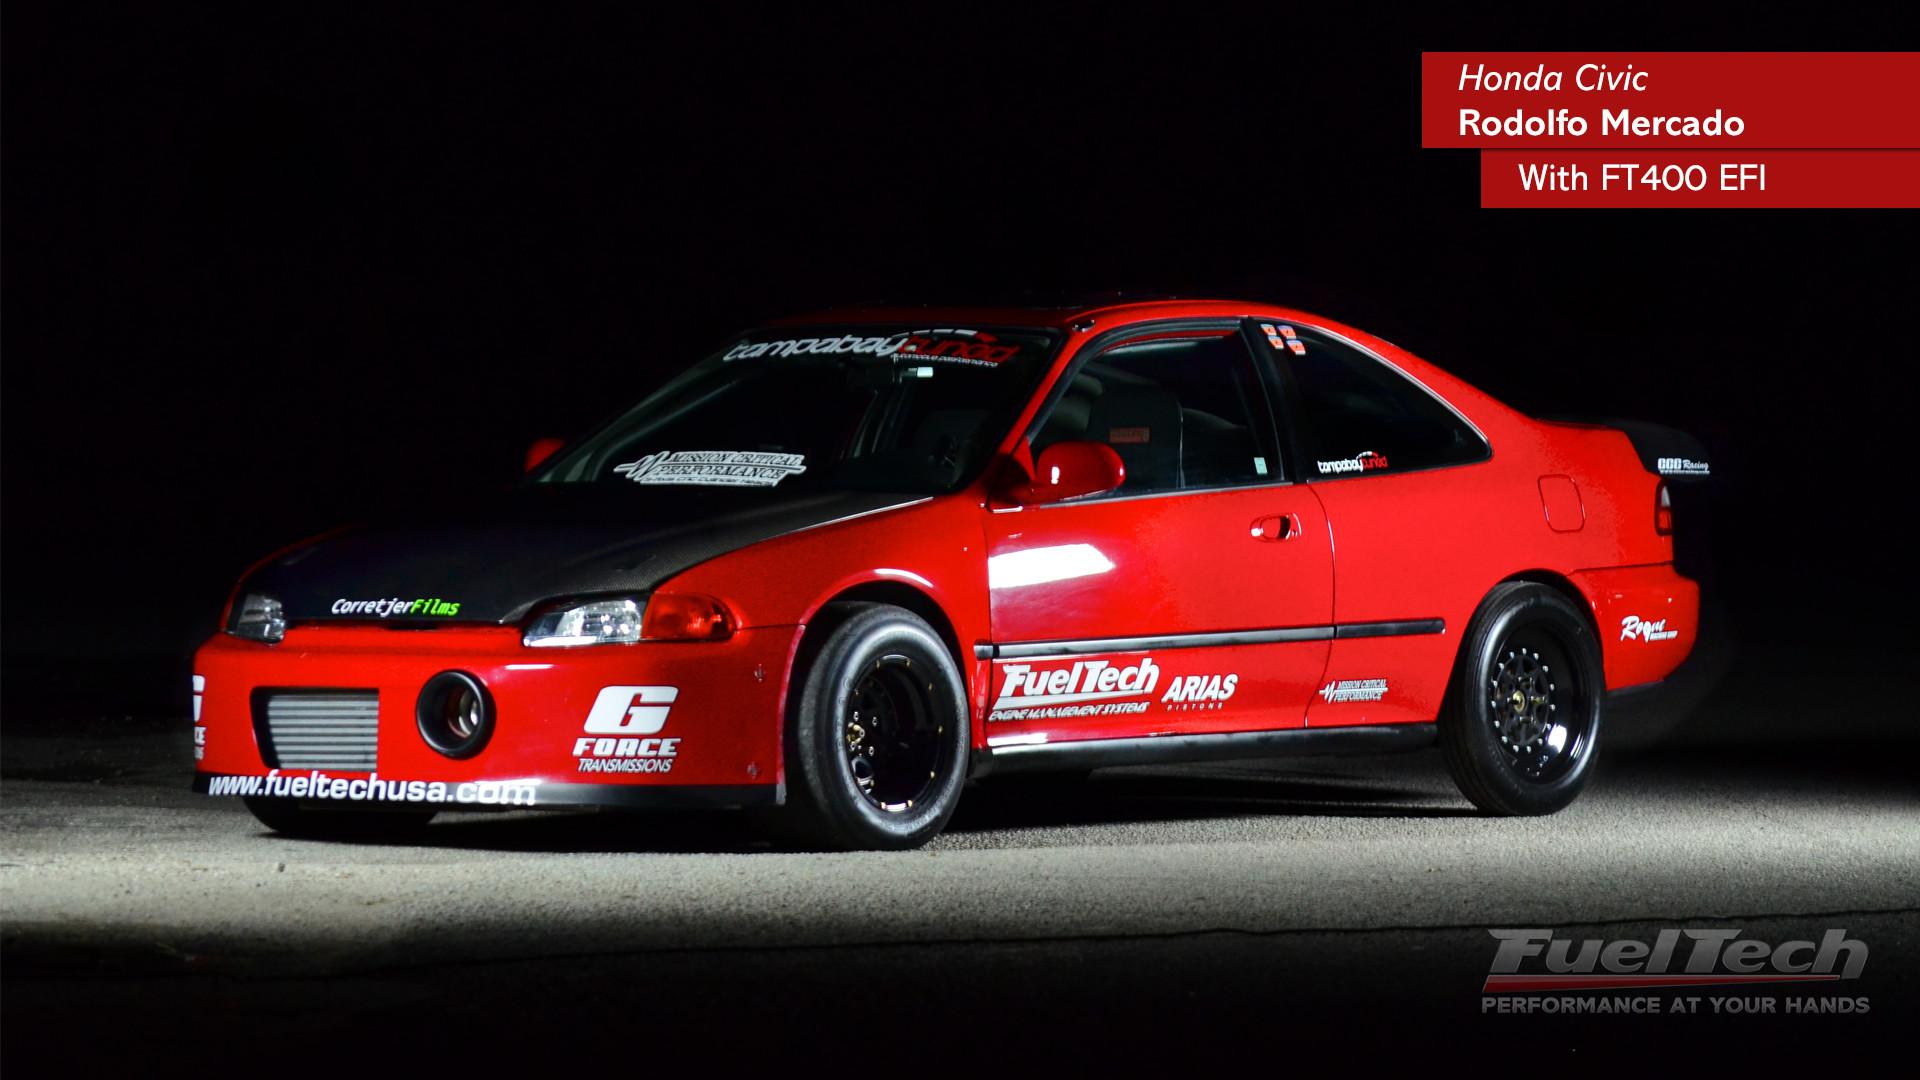 Honda – Rodolfo Mercado